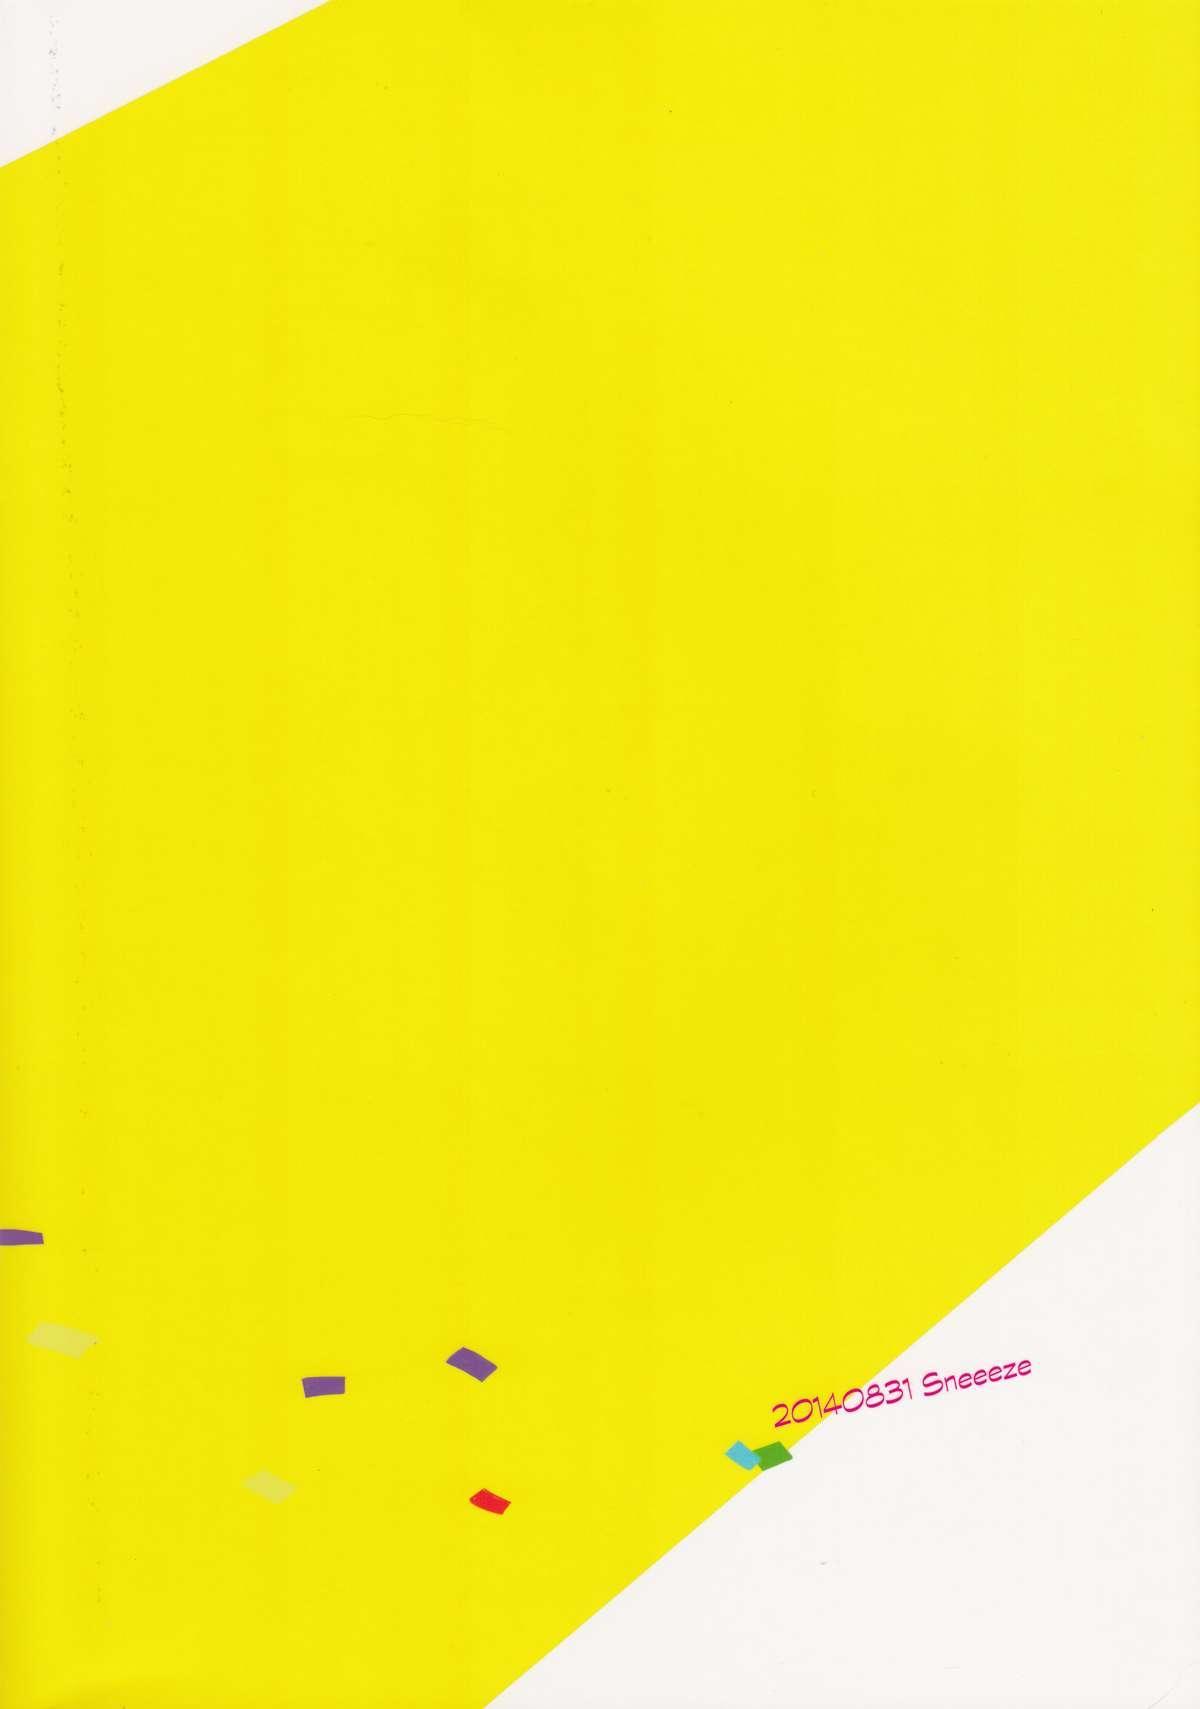 (Renai Endorphin 2) [Sneeeze (Kubu)] Cheer Haru-chan no Yuutsu | The Melancholy of Cheerleader Haru-chan (Free!) [English] {Anneioux} 25